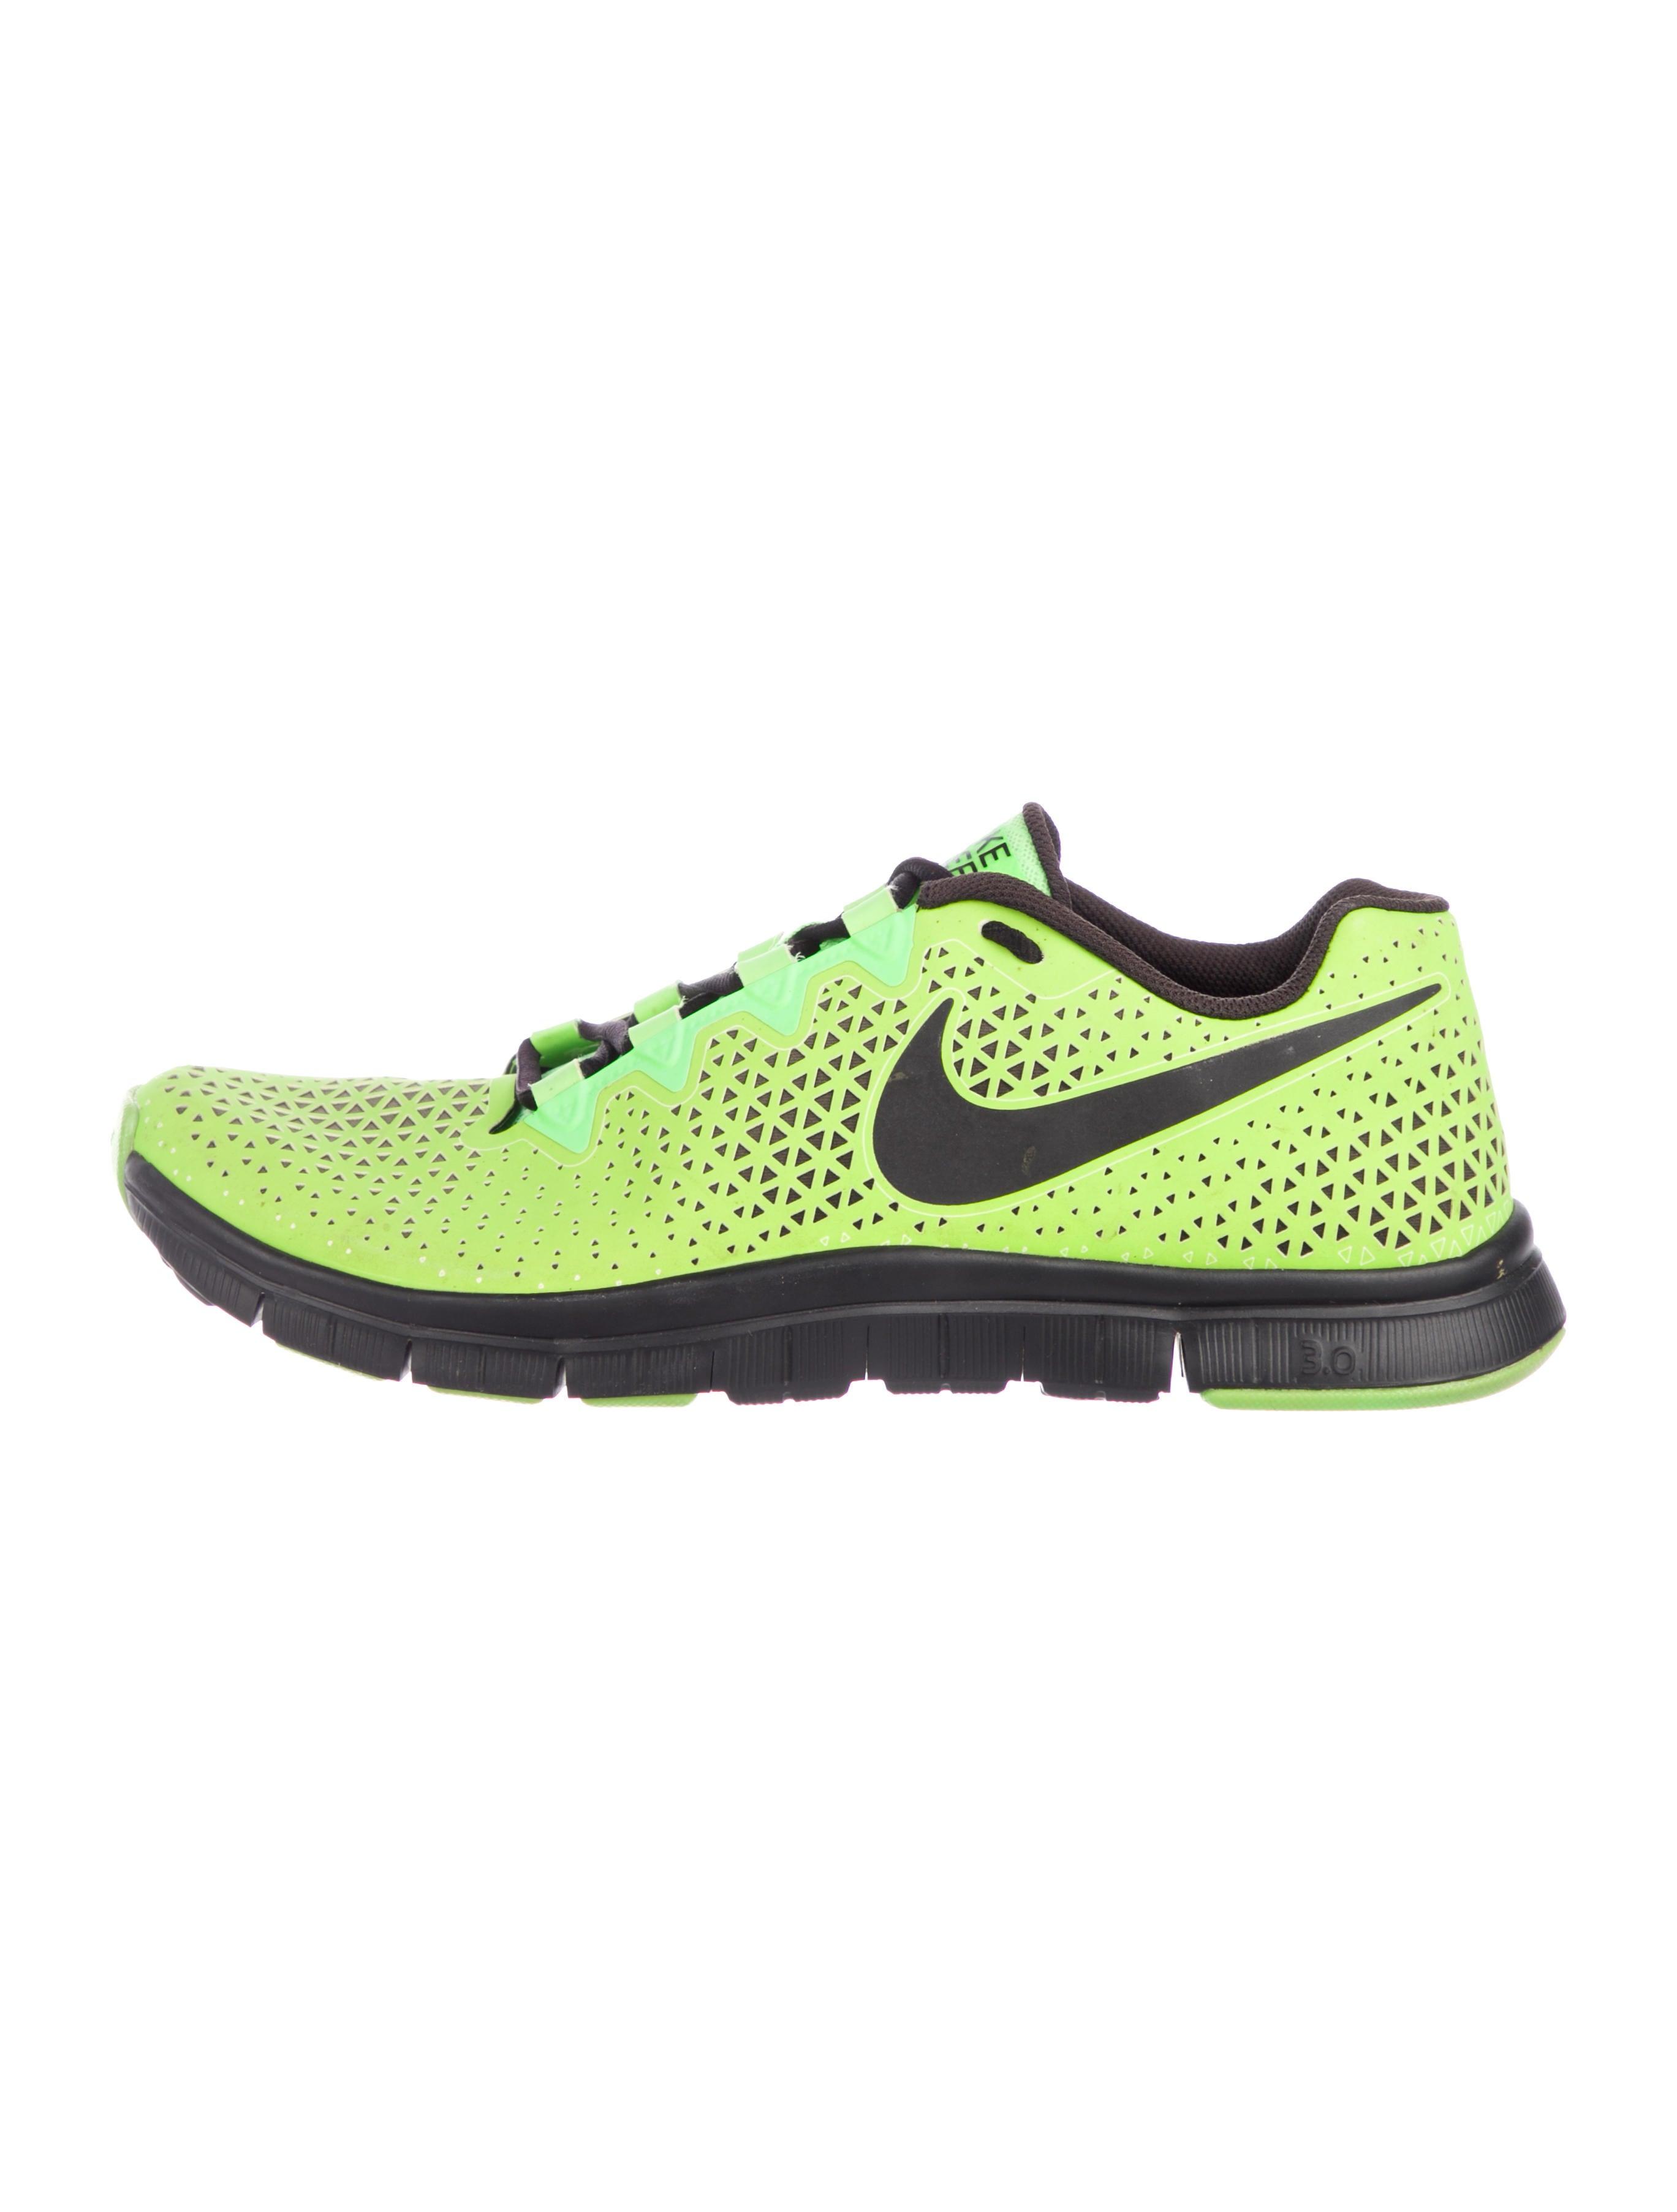 70dd050d9afa0 Nike Free Haven 3.0 Sneakers - Shoes - WU226480